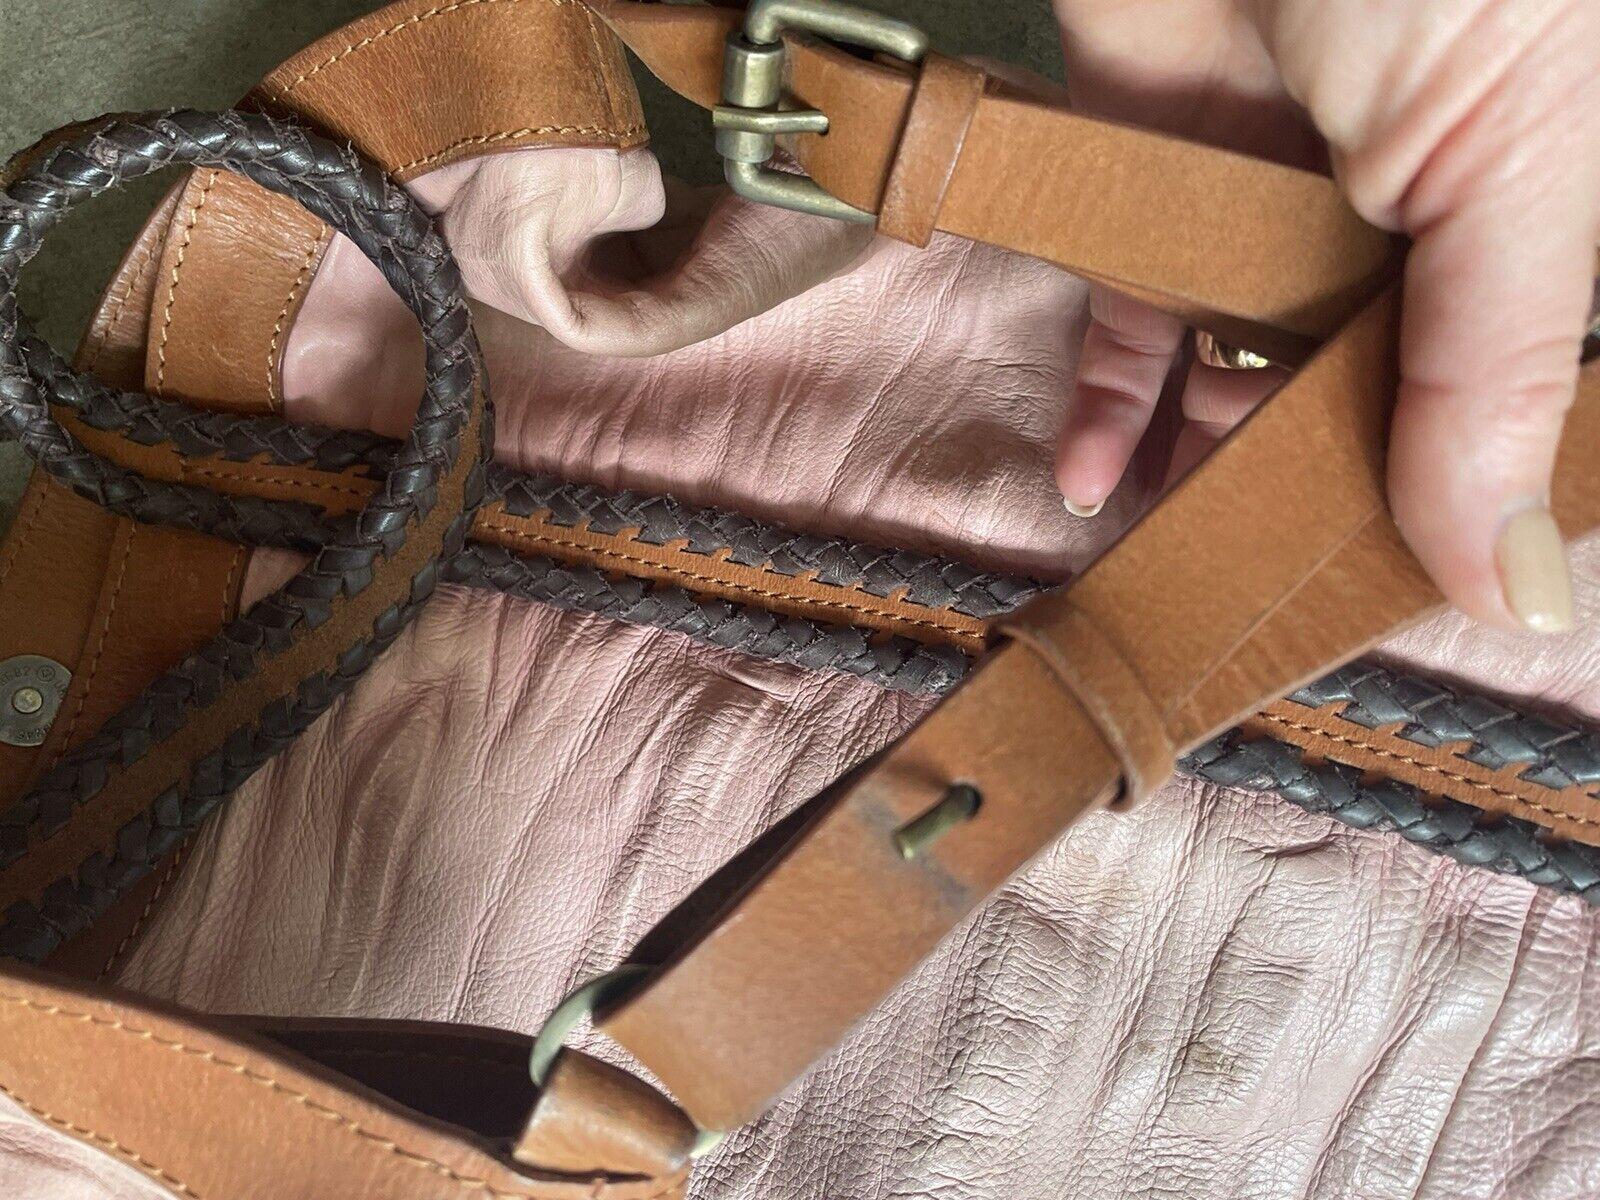 holding horses Leather Dusty Pink bag - image 5